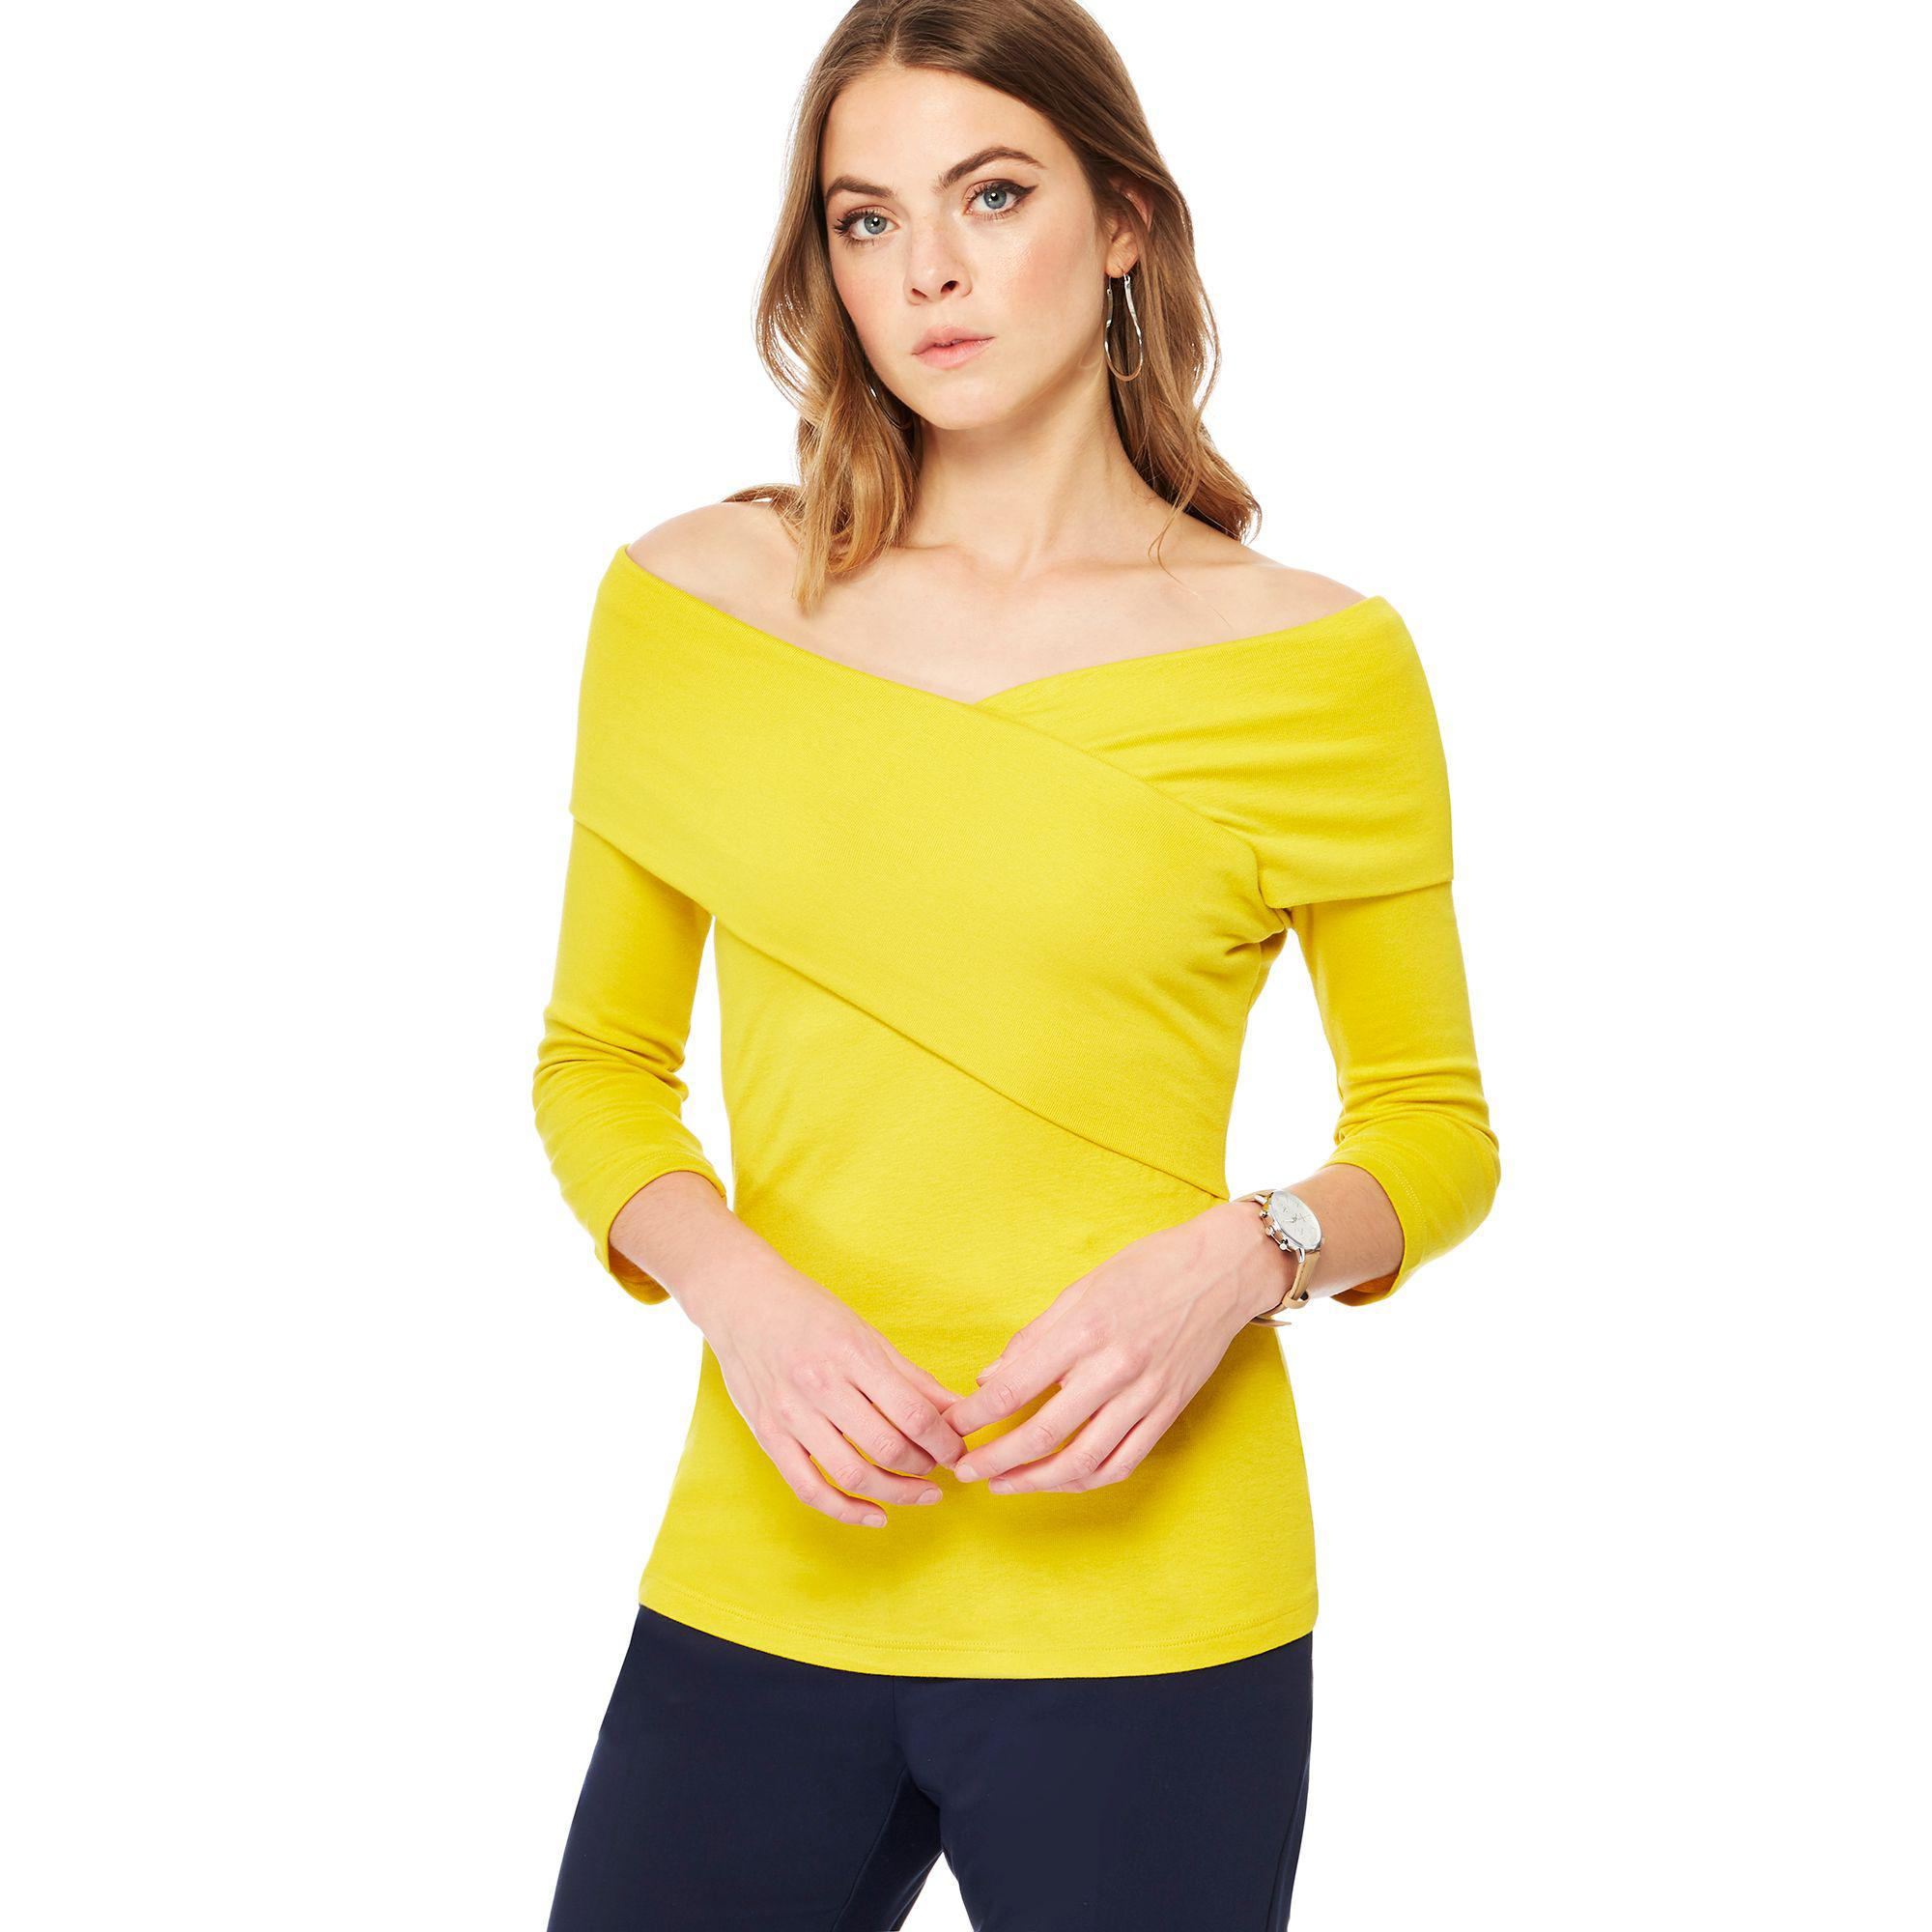 c57d46993cfa1 J By Jasper Conran Bright Yellow Jersey Bardot Neck Top in Yellow - Lyst